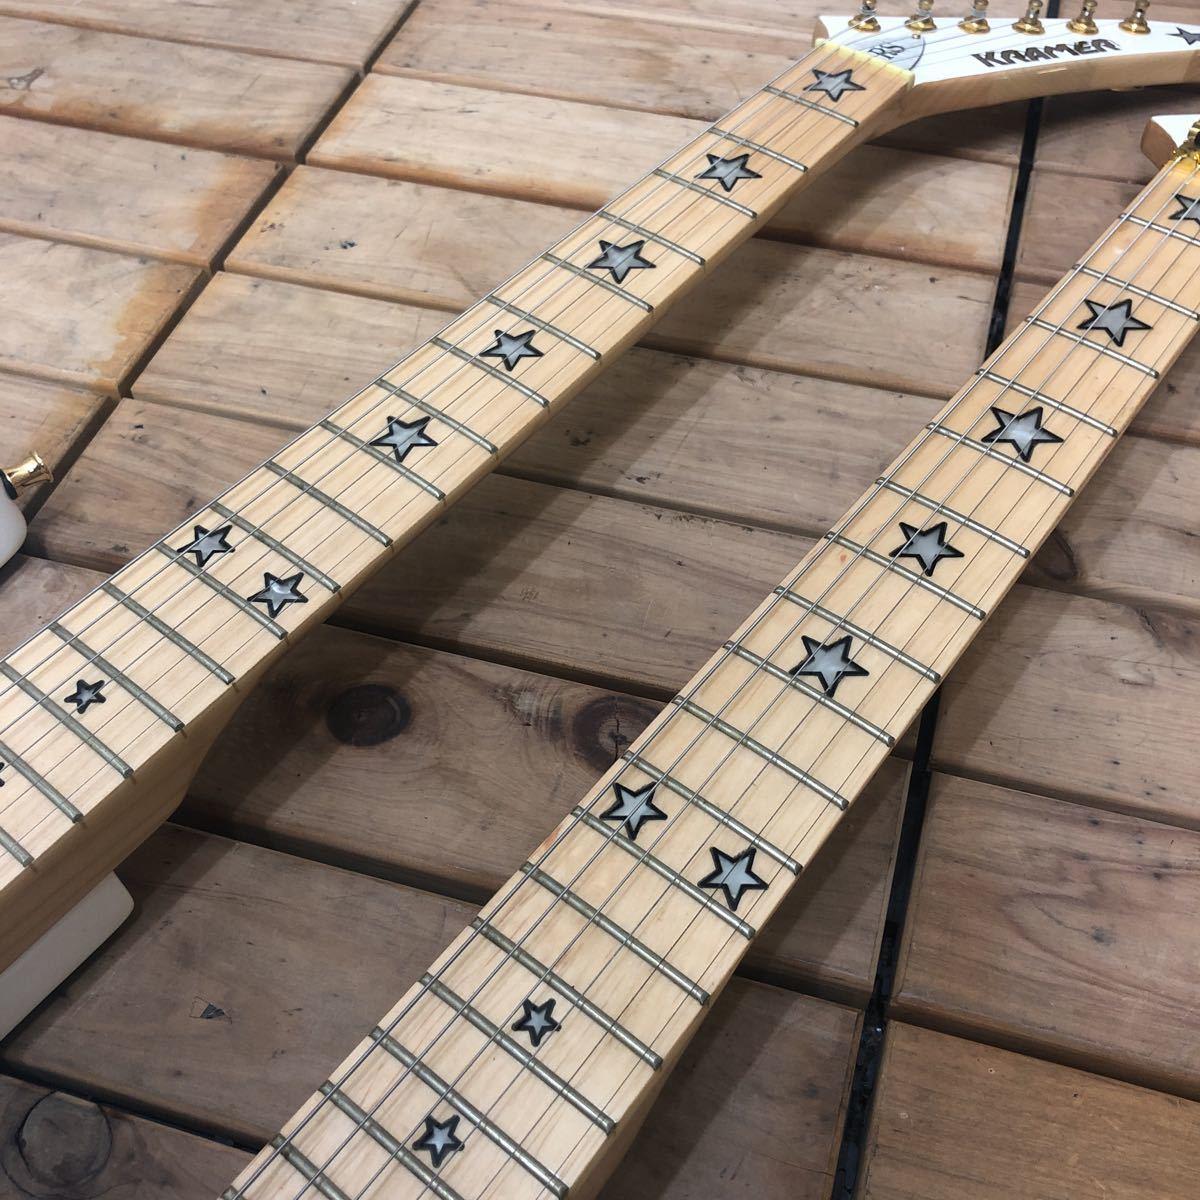 XM☆希少 KRAMER Richie sambora/Bon Jovi signature 激レア ダブルネック エレキギター リッチー・サンボラ モデル FLOYD ROSE搭載 美品_画像6